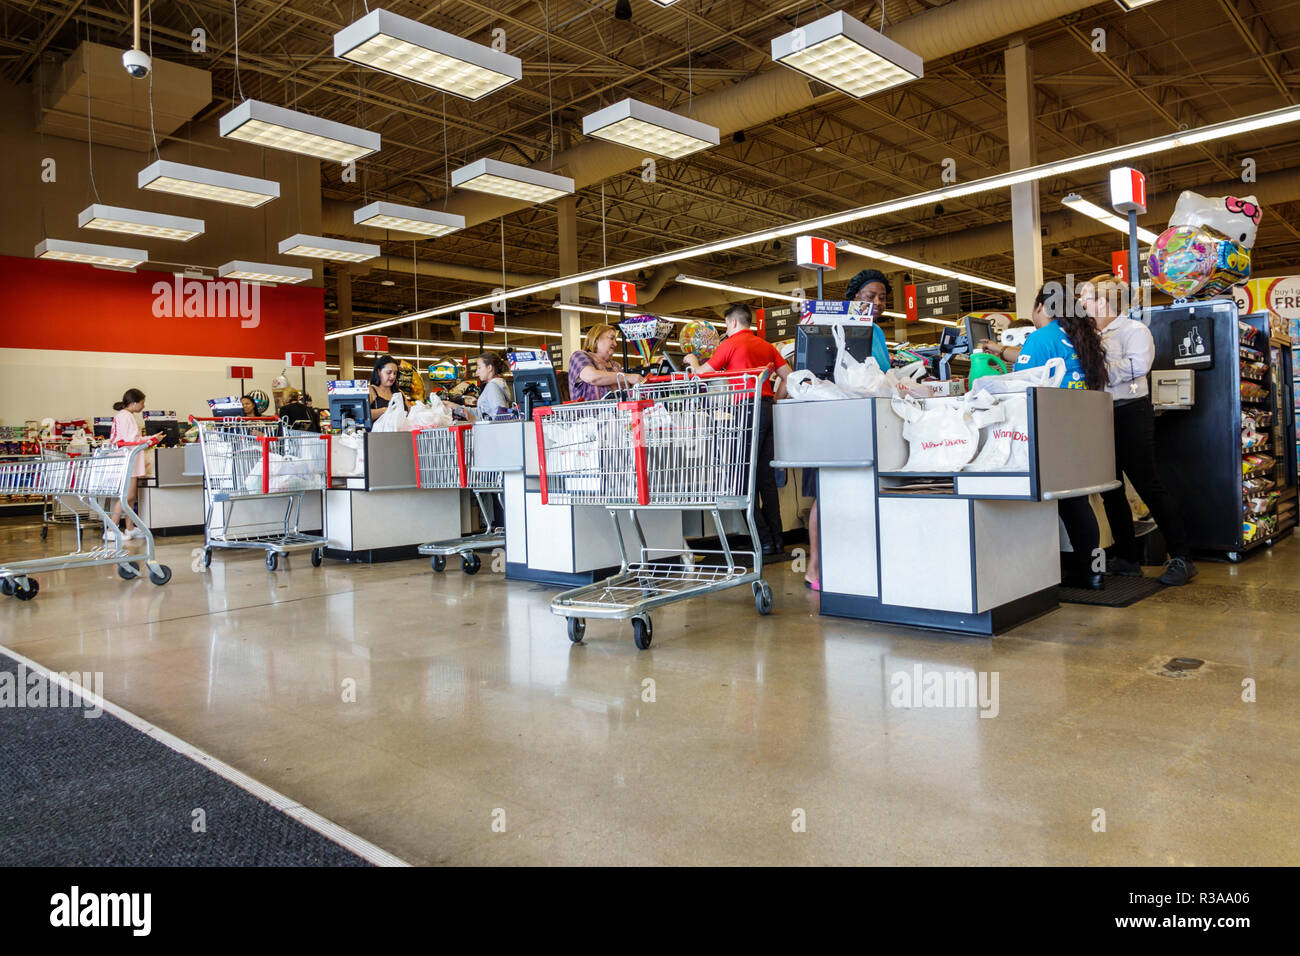 Miami Florida Winn-Dixie grocery store supermarket food checkout line queue cashiers cashier - Stock Image